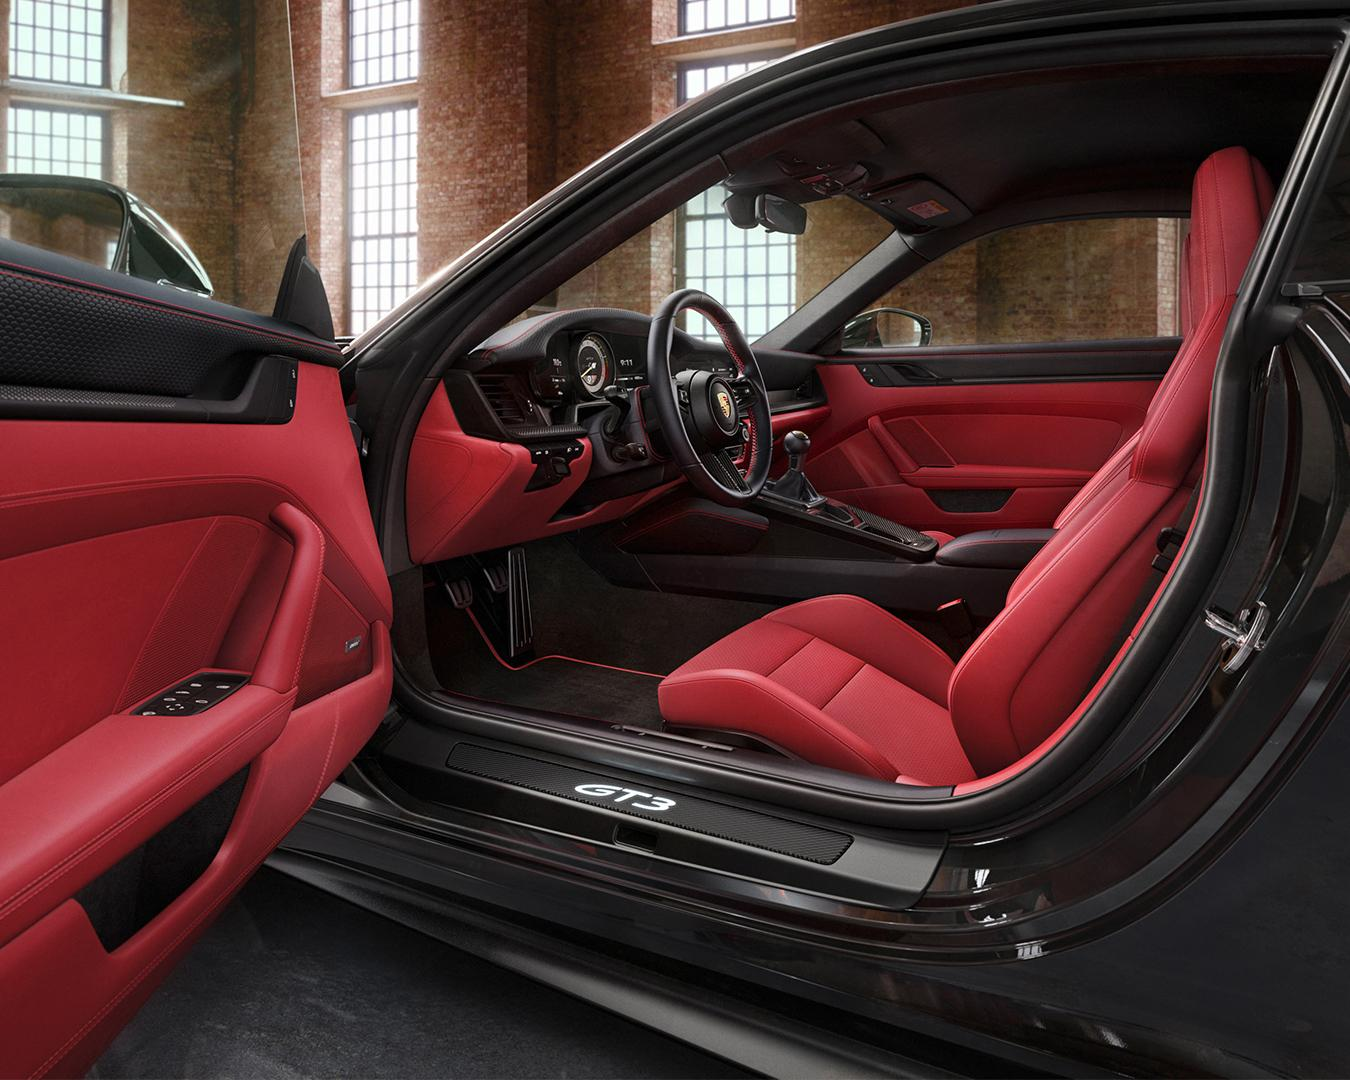 Porsche-911-GT3-Touring-by-Porsche-Exclusive-Manufaktur-5